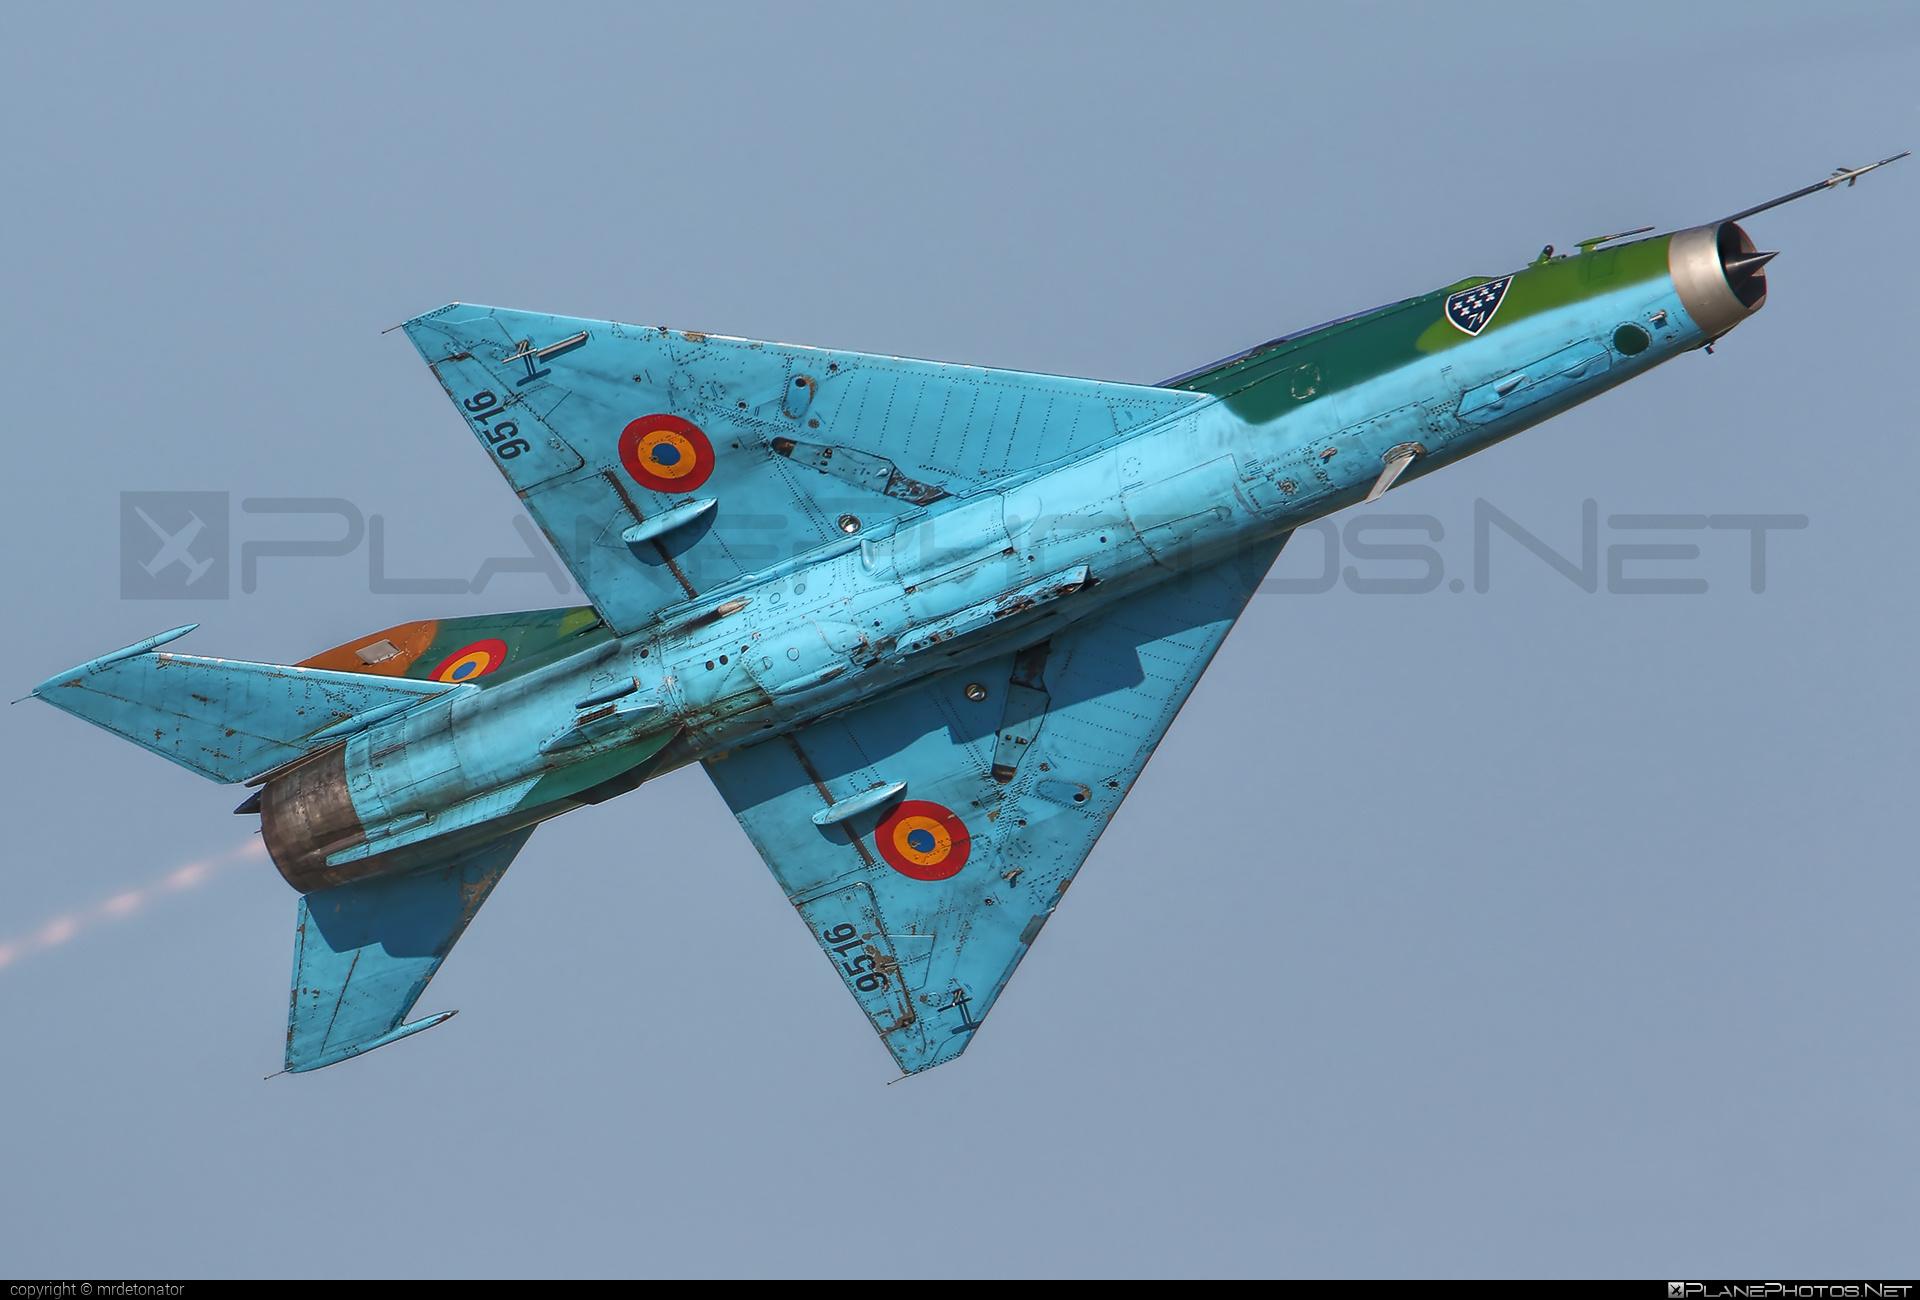 Mikoyan-Gurevich MiG-21UM - 9516 operated by Forţele Aeriene Române (Romanian Air Force) #forteleaerieneromane #mig #mig21 #mig21um #mikoyangurevich #romanianairforce